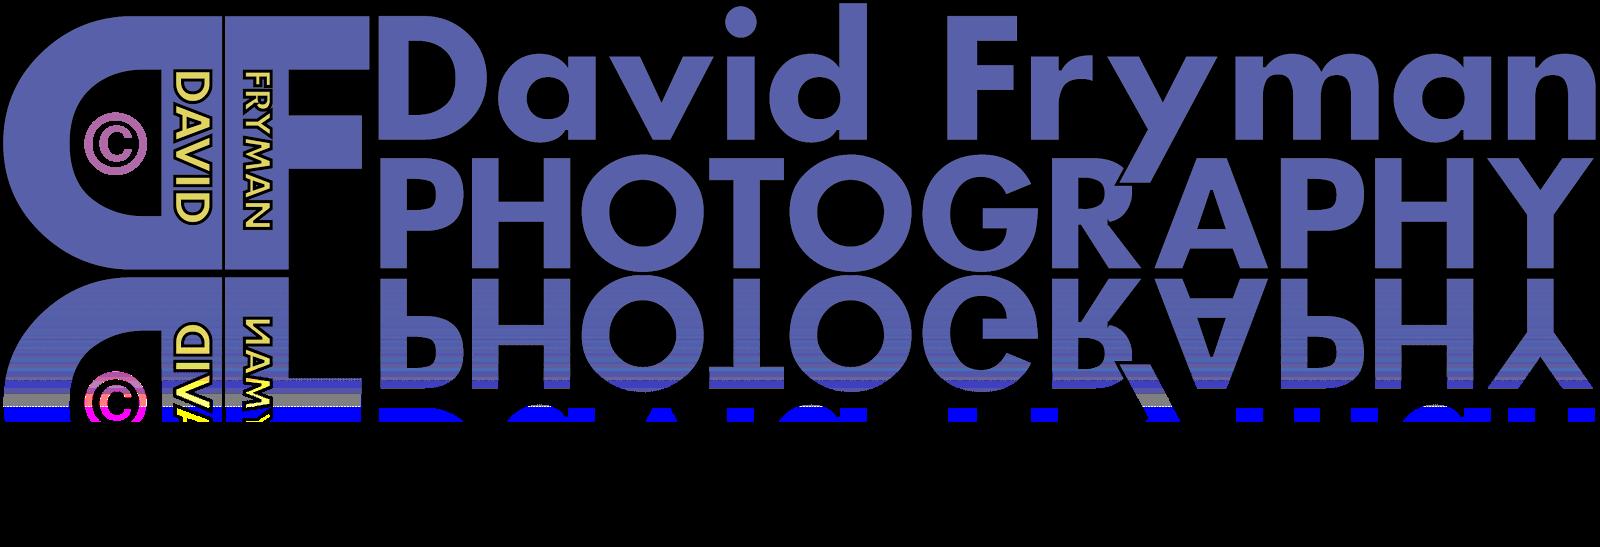 David Fryman Photography